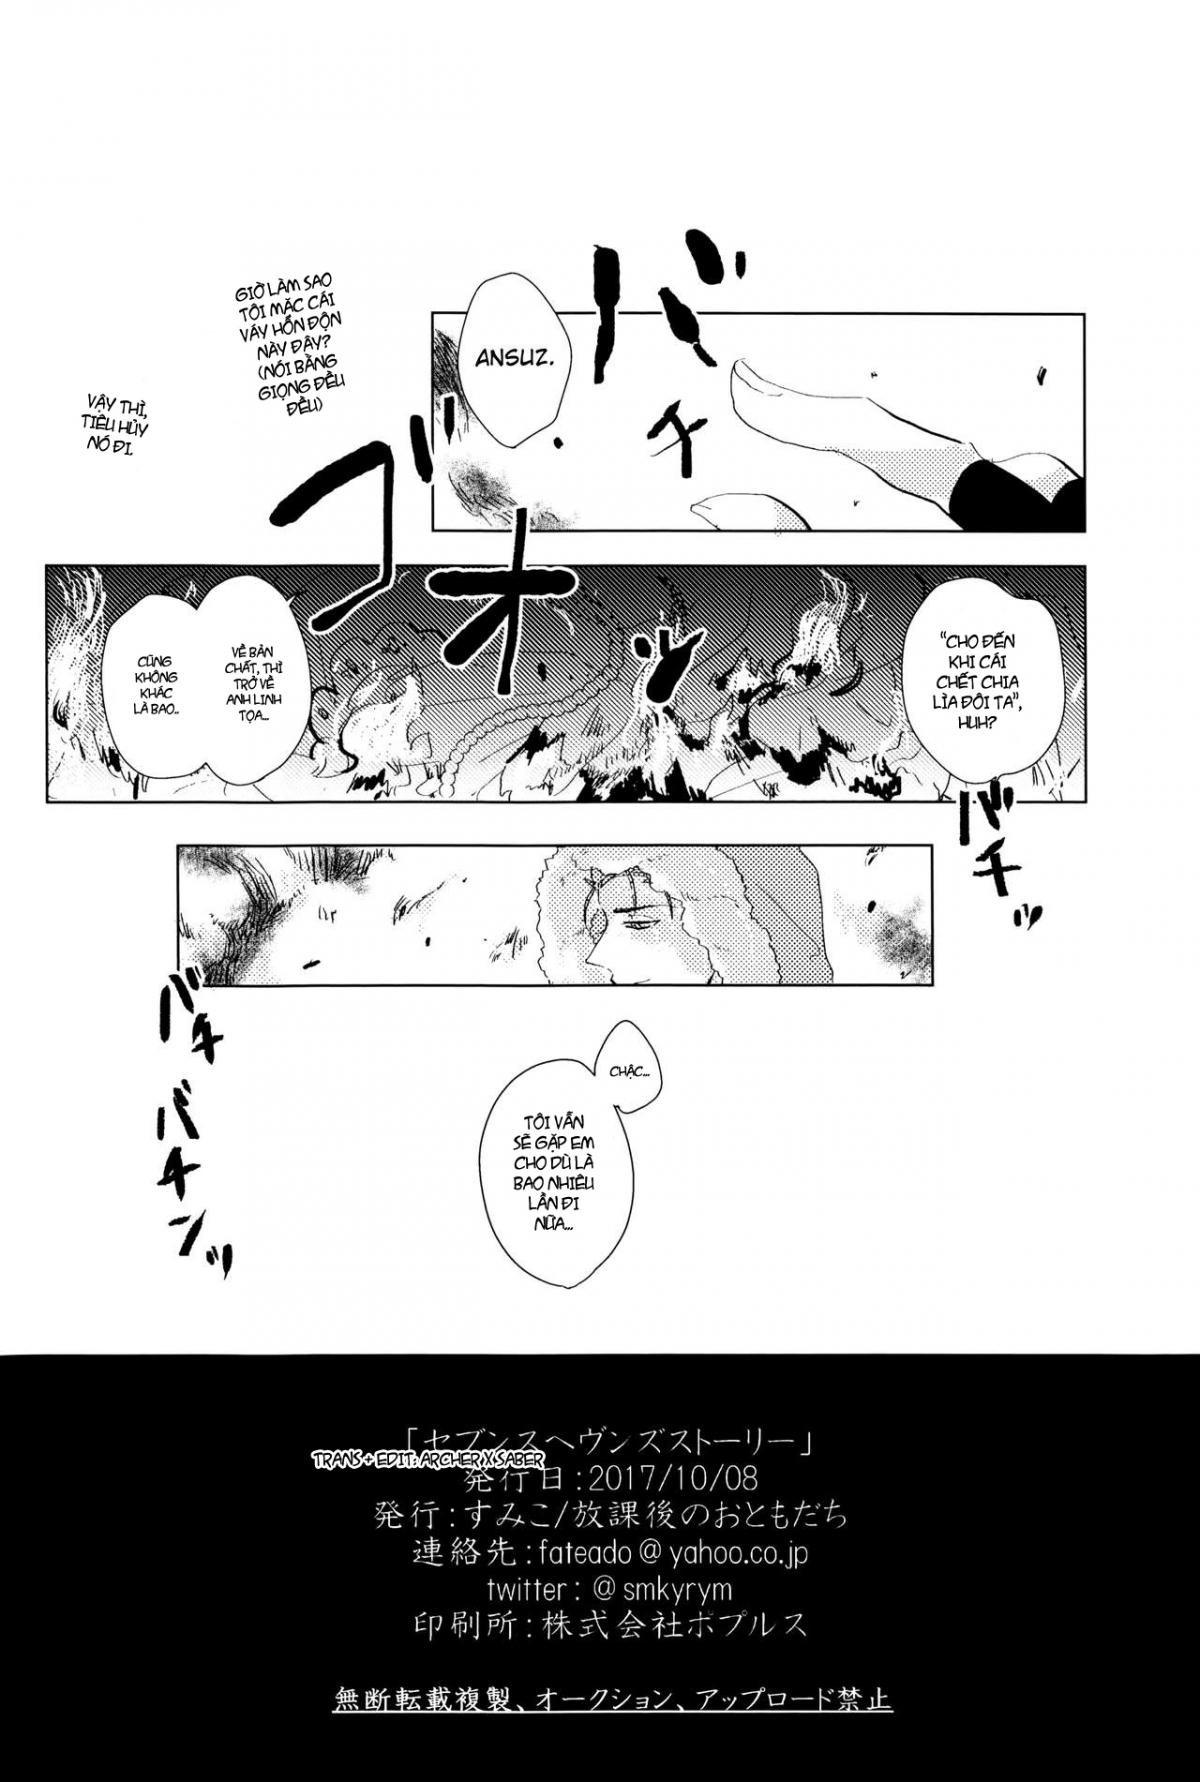 HentaiVN.net - Ảnh 28 - Seventh Heavens Story (Fate/Grand Order) - Oneshot